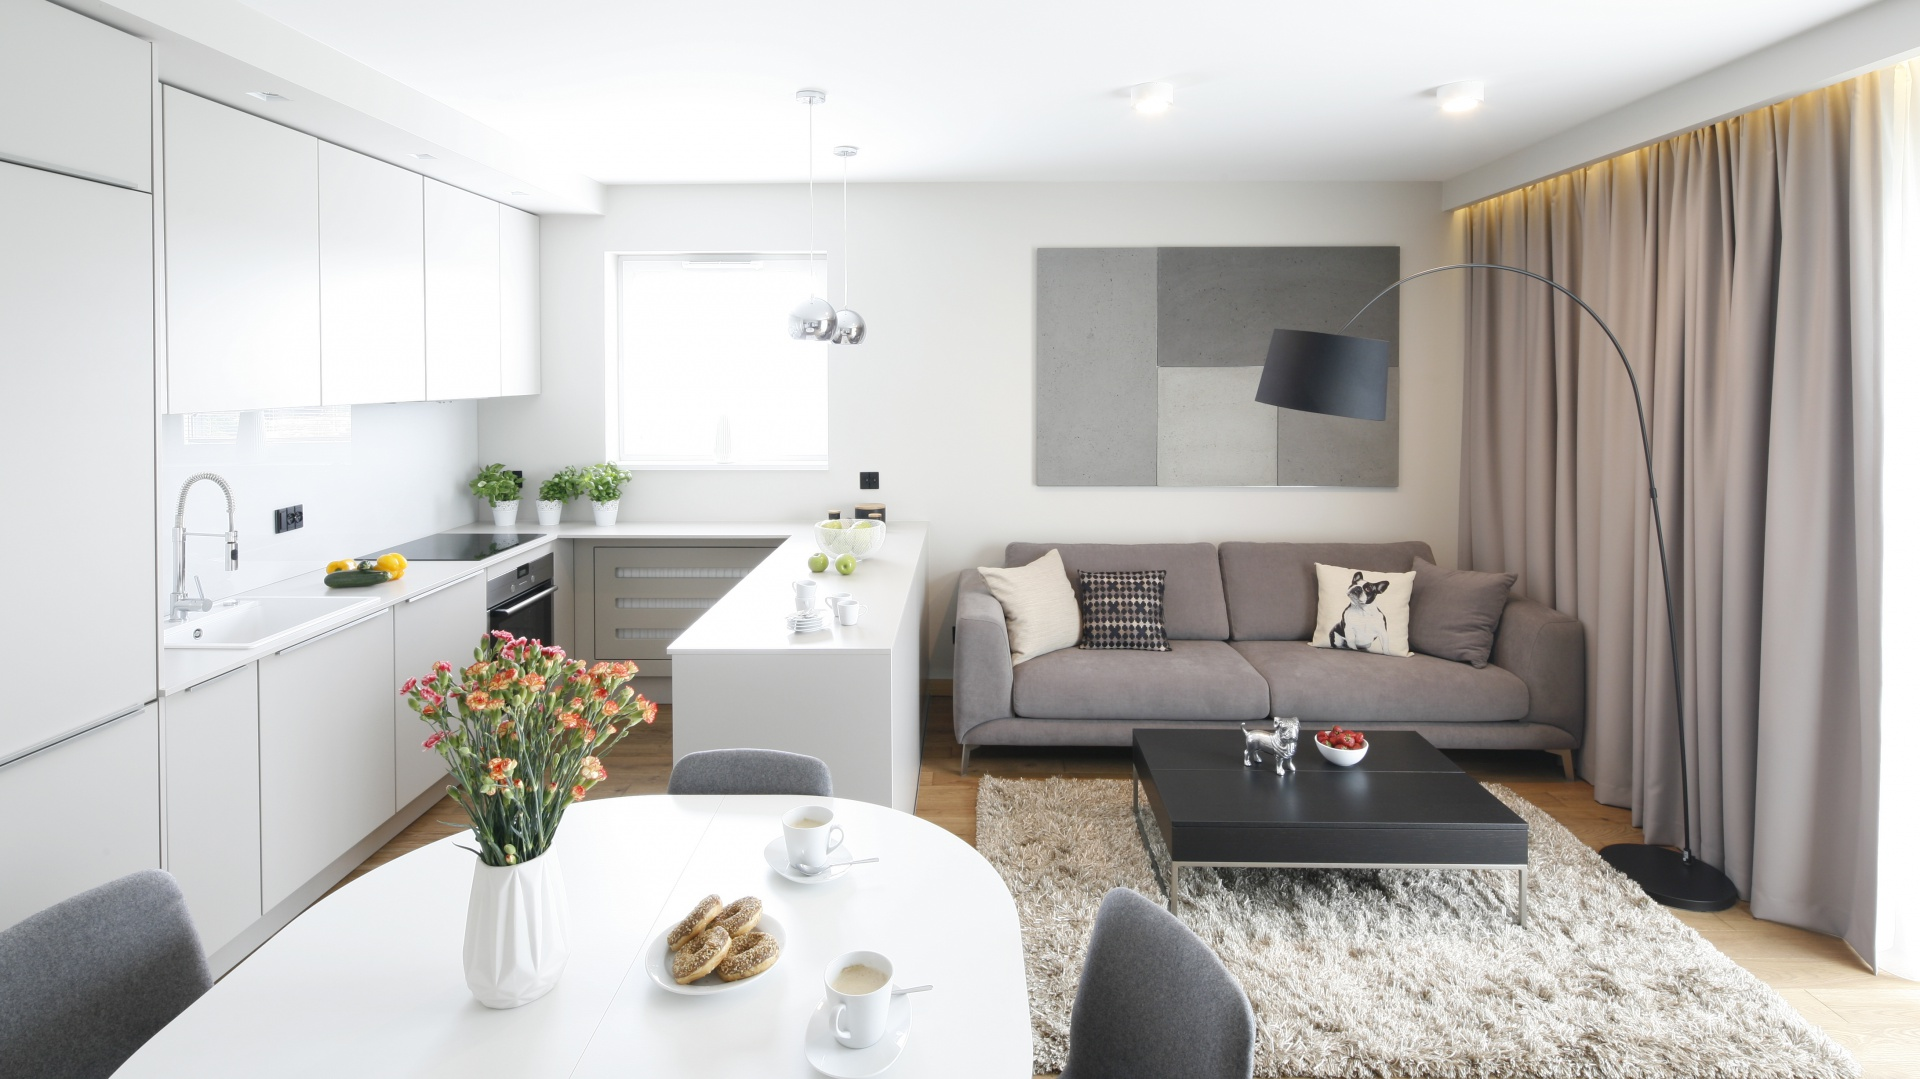 Ma y salon projekt ma y salon 20 propozycji z for Ikea petit appartement